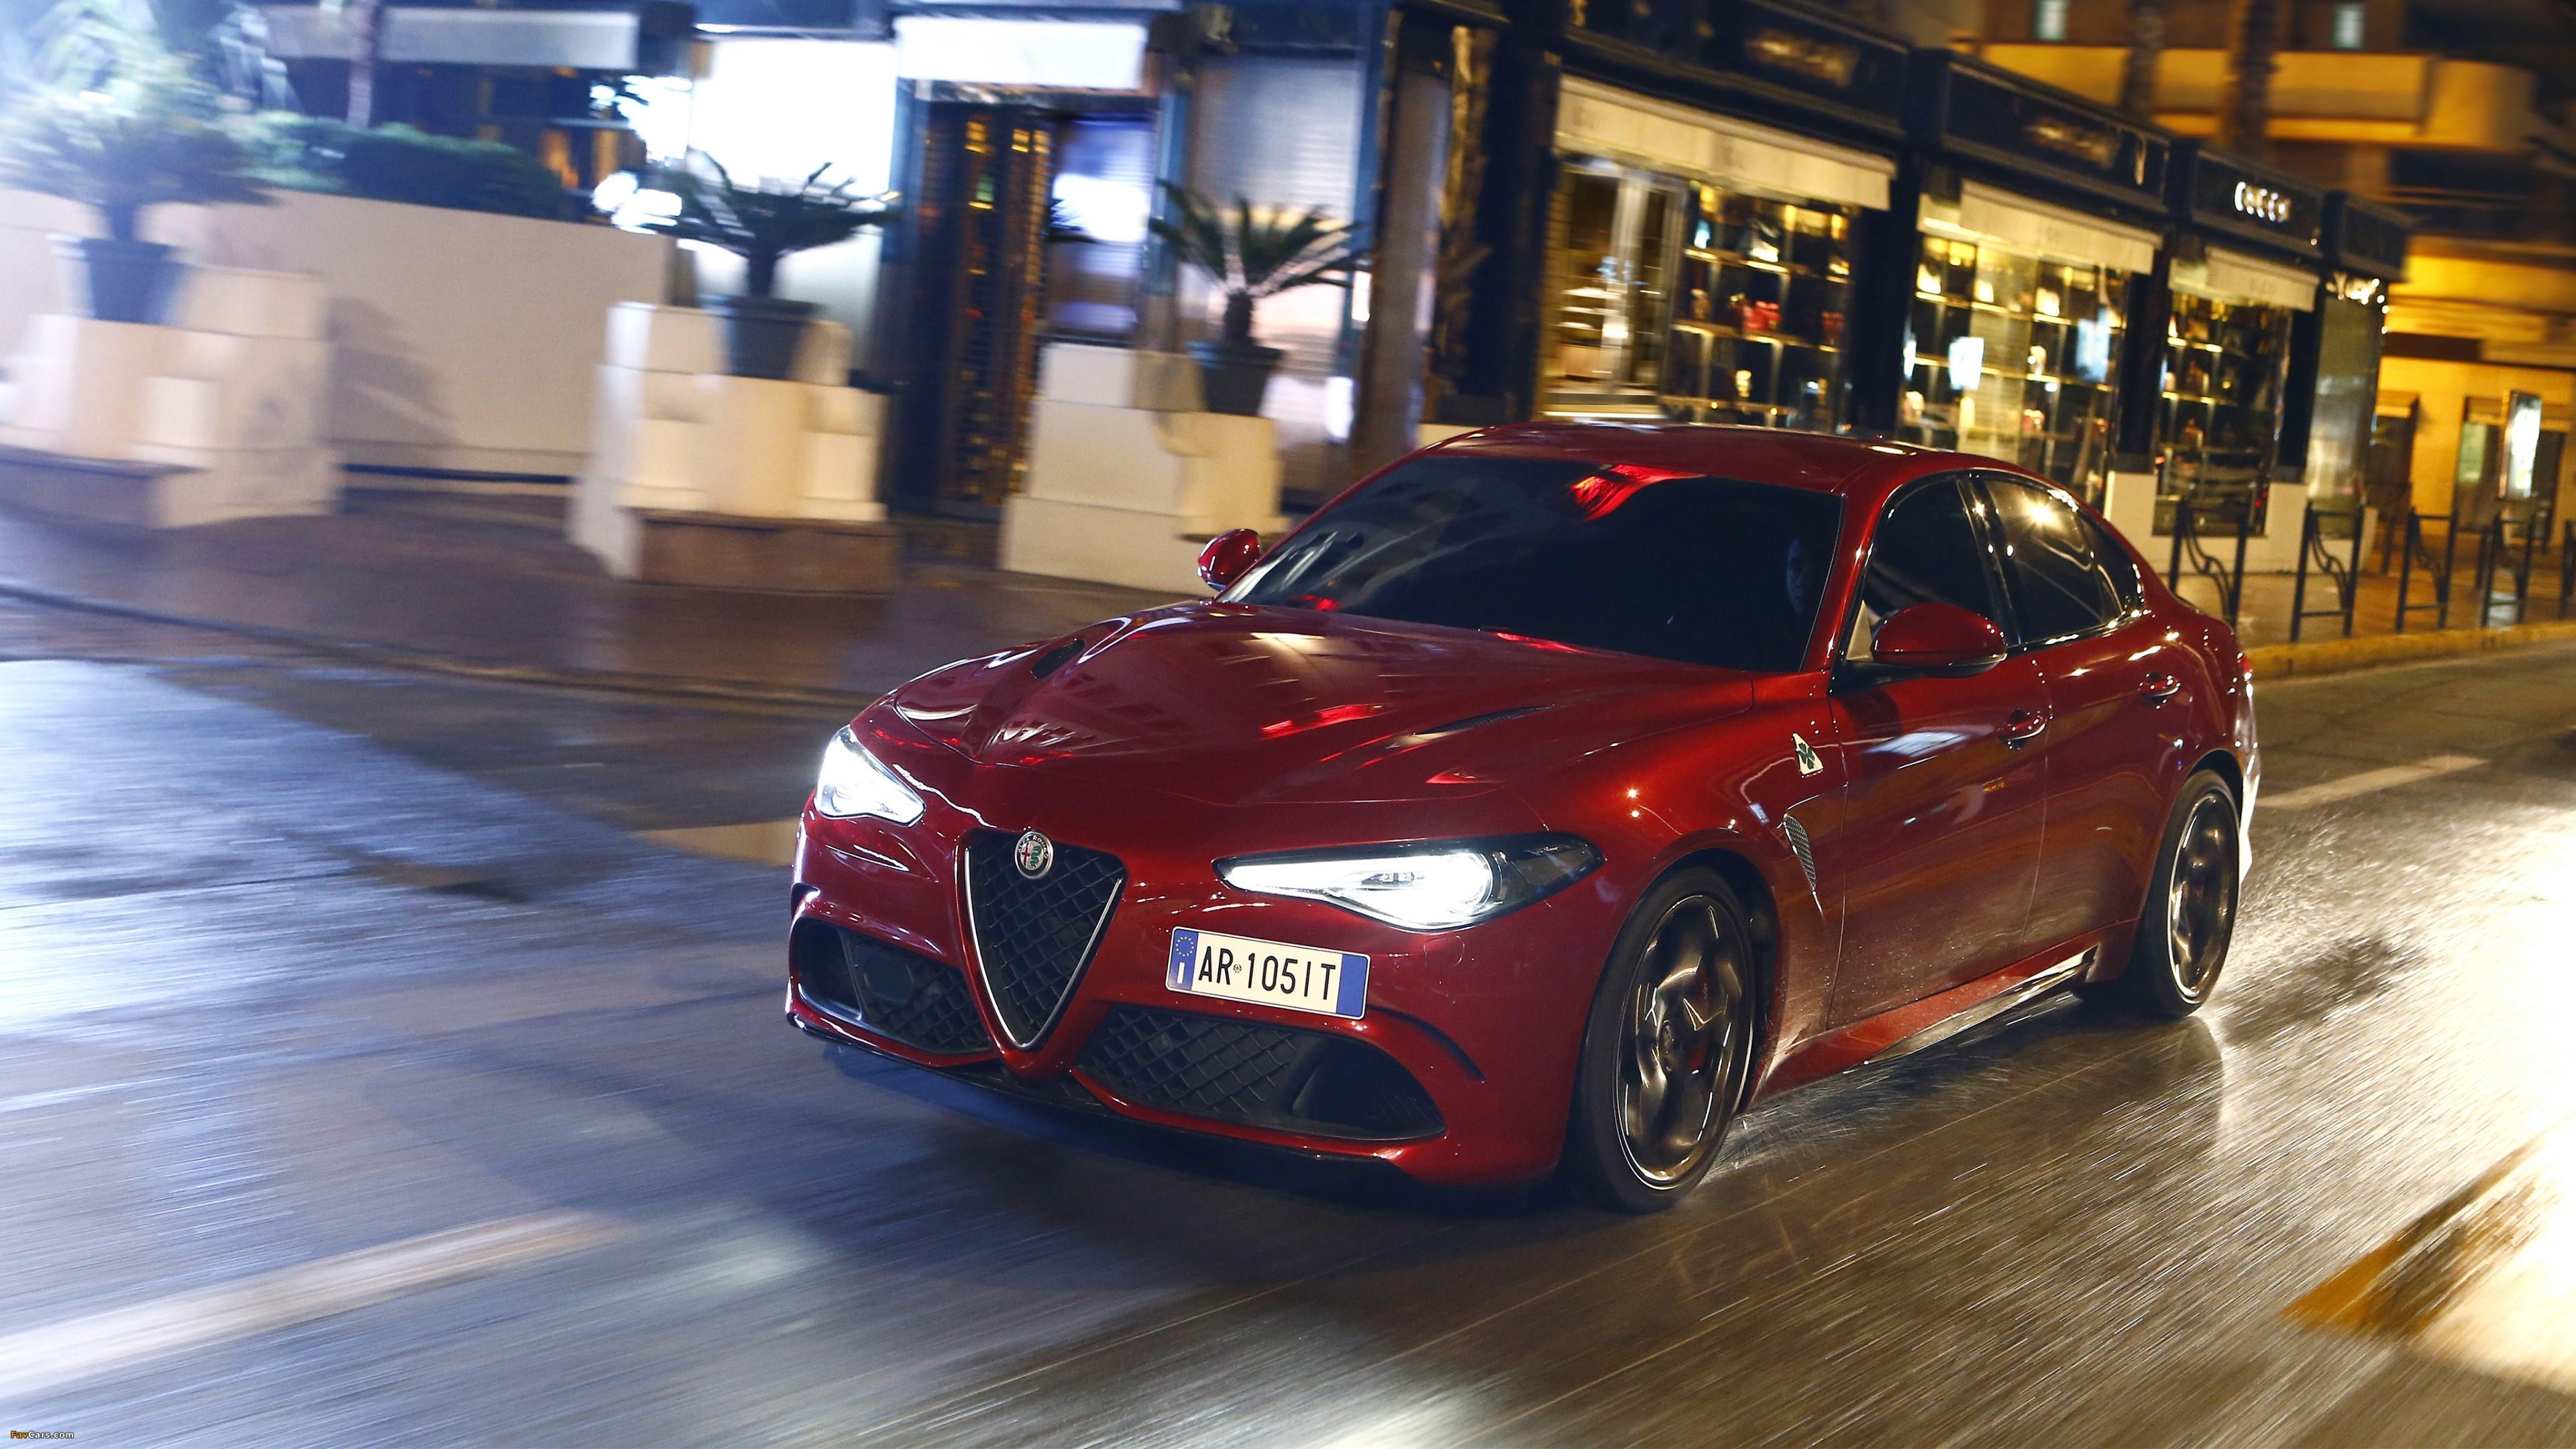 Alfa Romeo Giulia Qv 4k Ultrahd Wallpaper Backiee Free